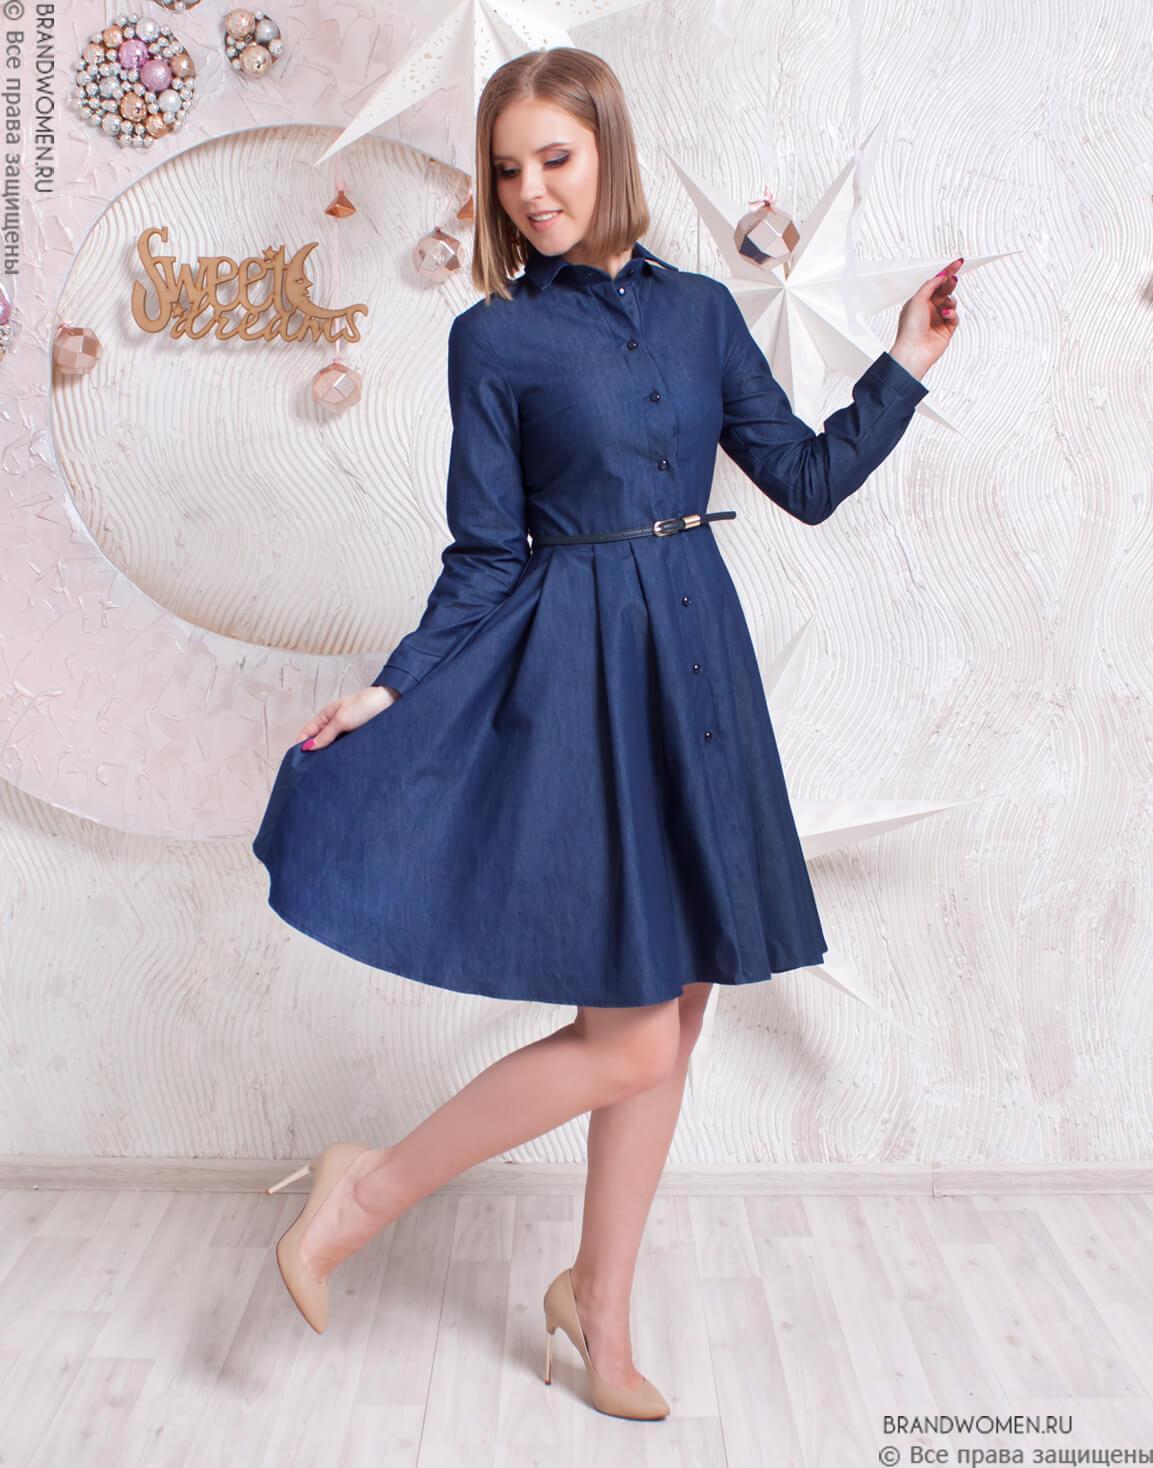 a1f0a1fbf69b317 Джинсовое платье-мини на пуговицах